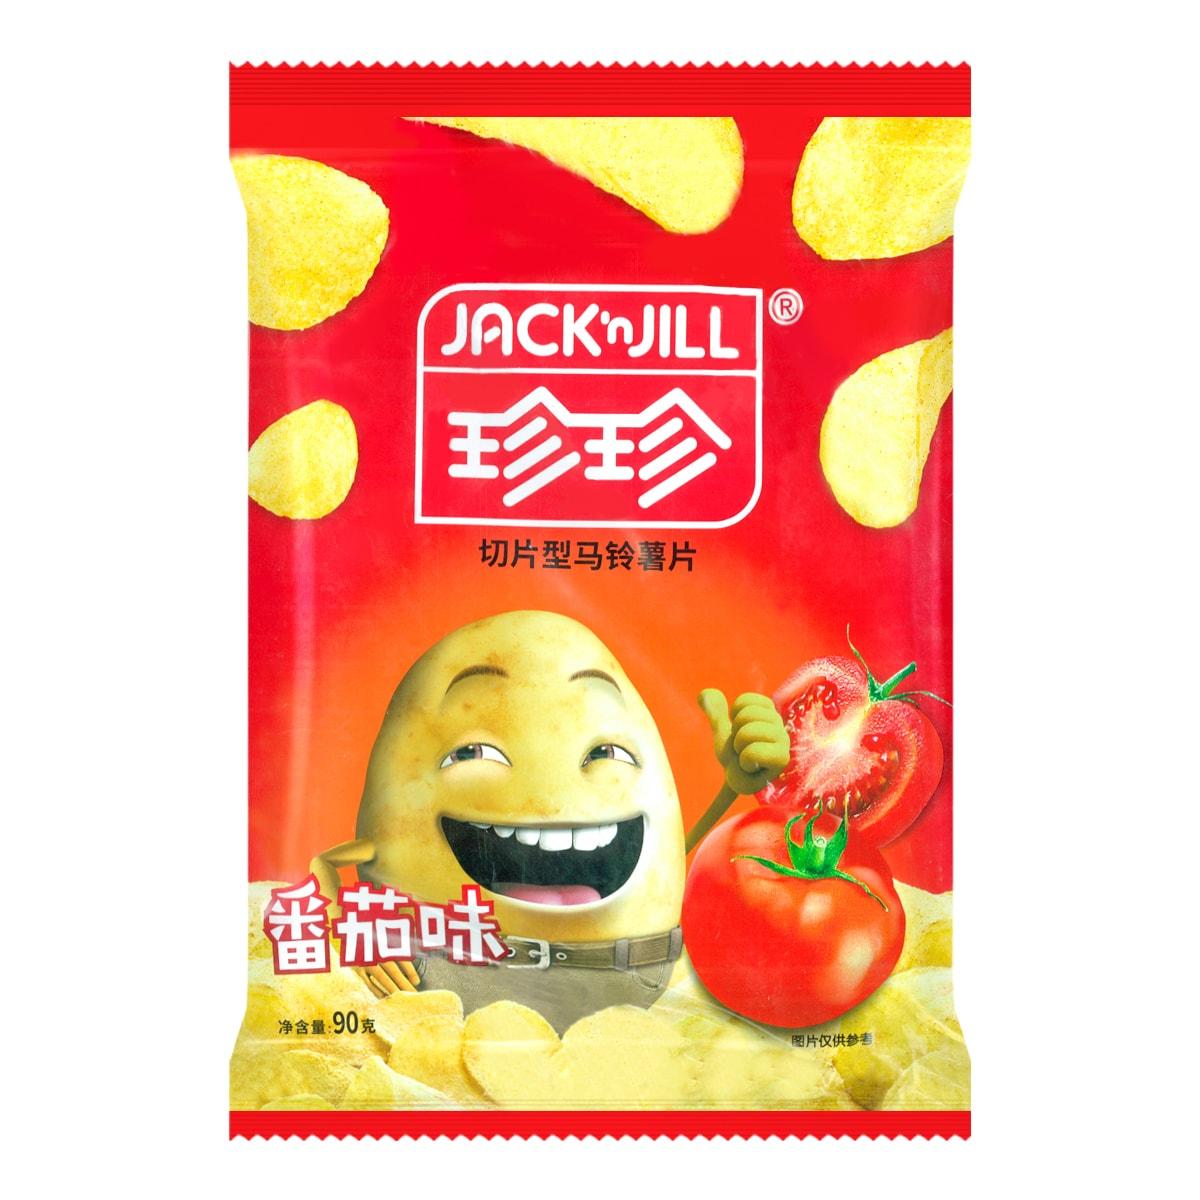 JACK N JILL珍珍 切片型马铃薯片 番茄味 90g